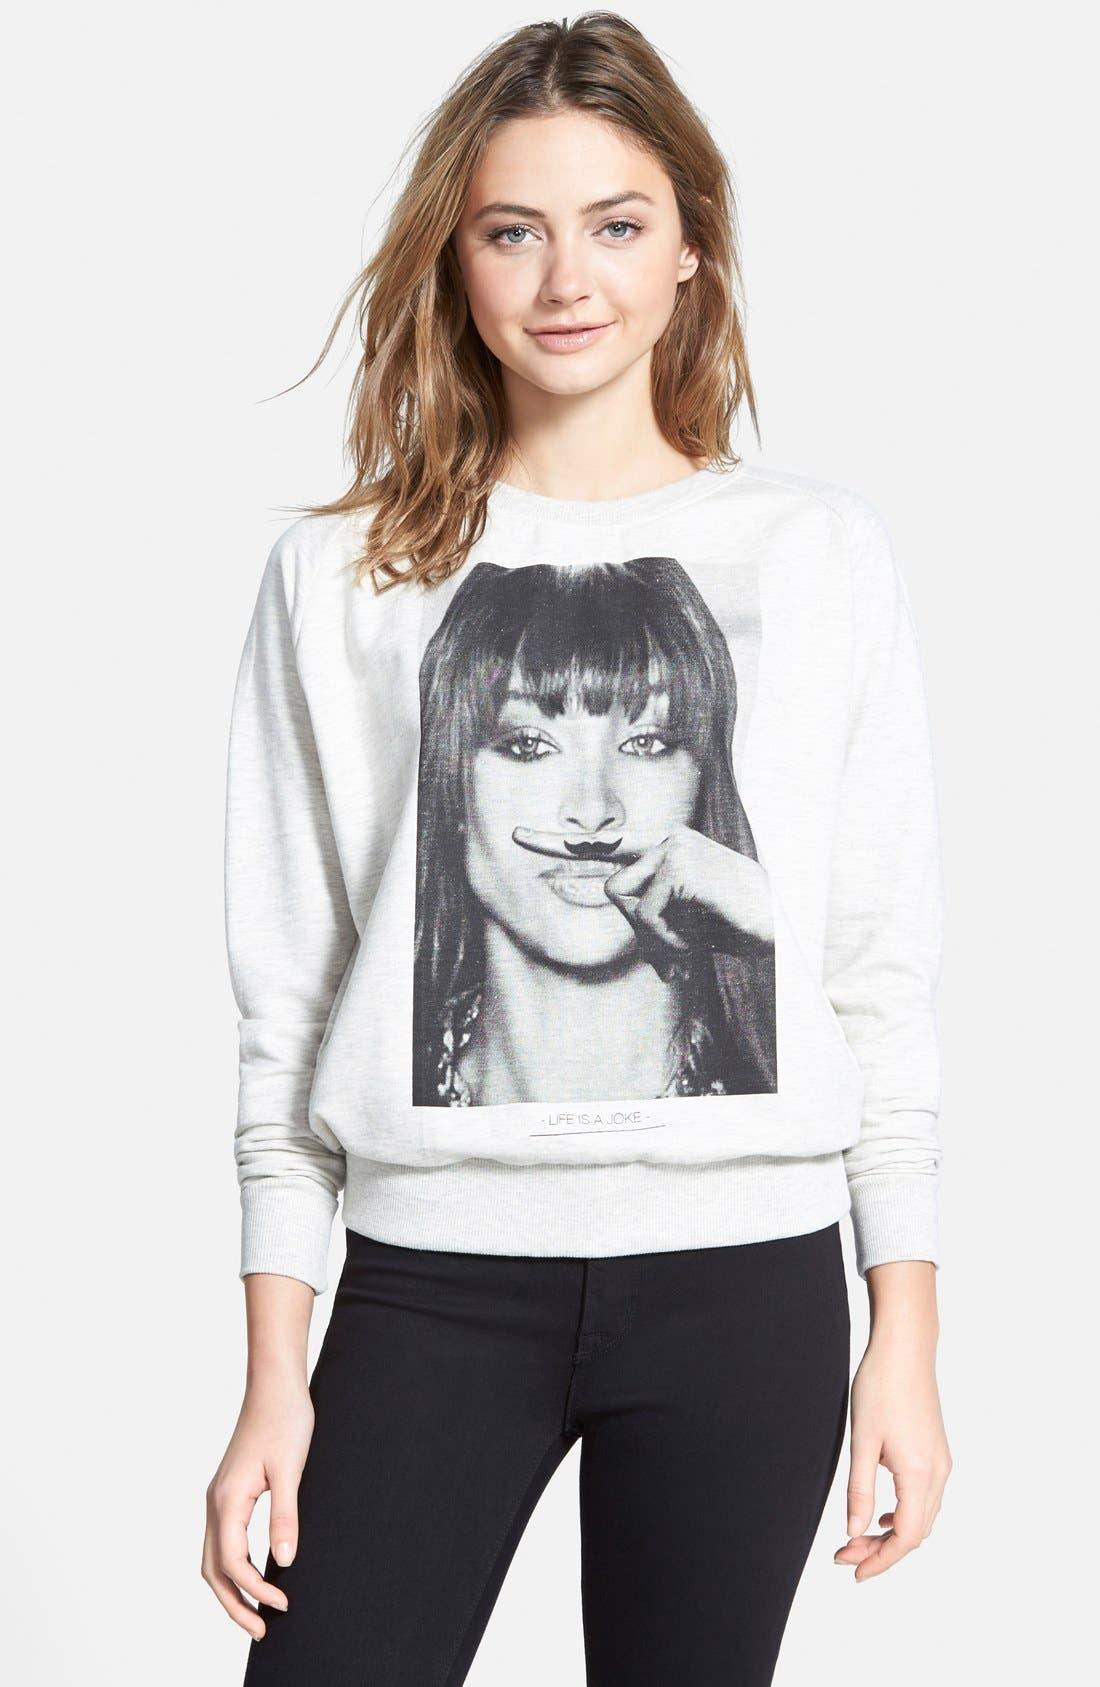 Main Image - ELEVENPARIS 'Life Is a Joke' Pullover Sweatshirt